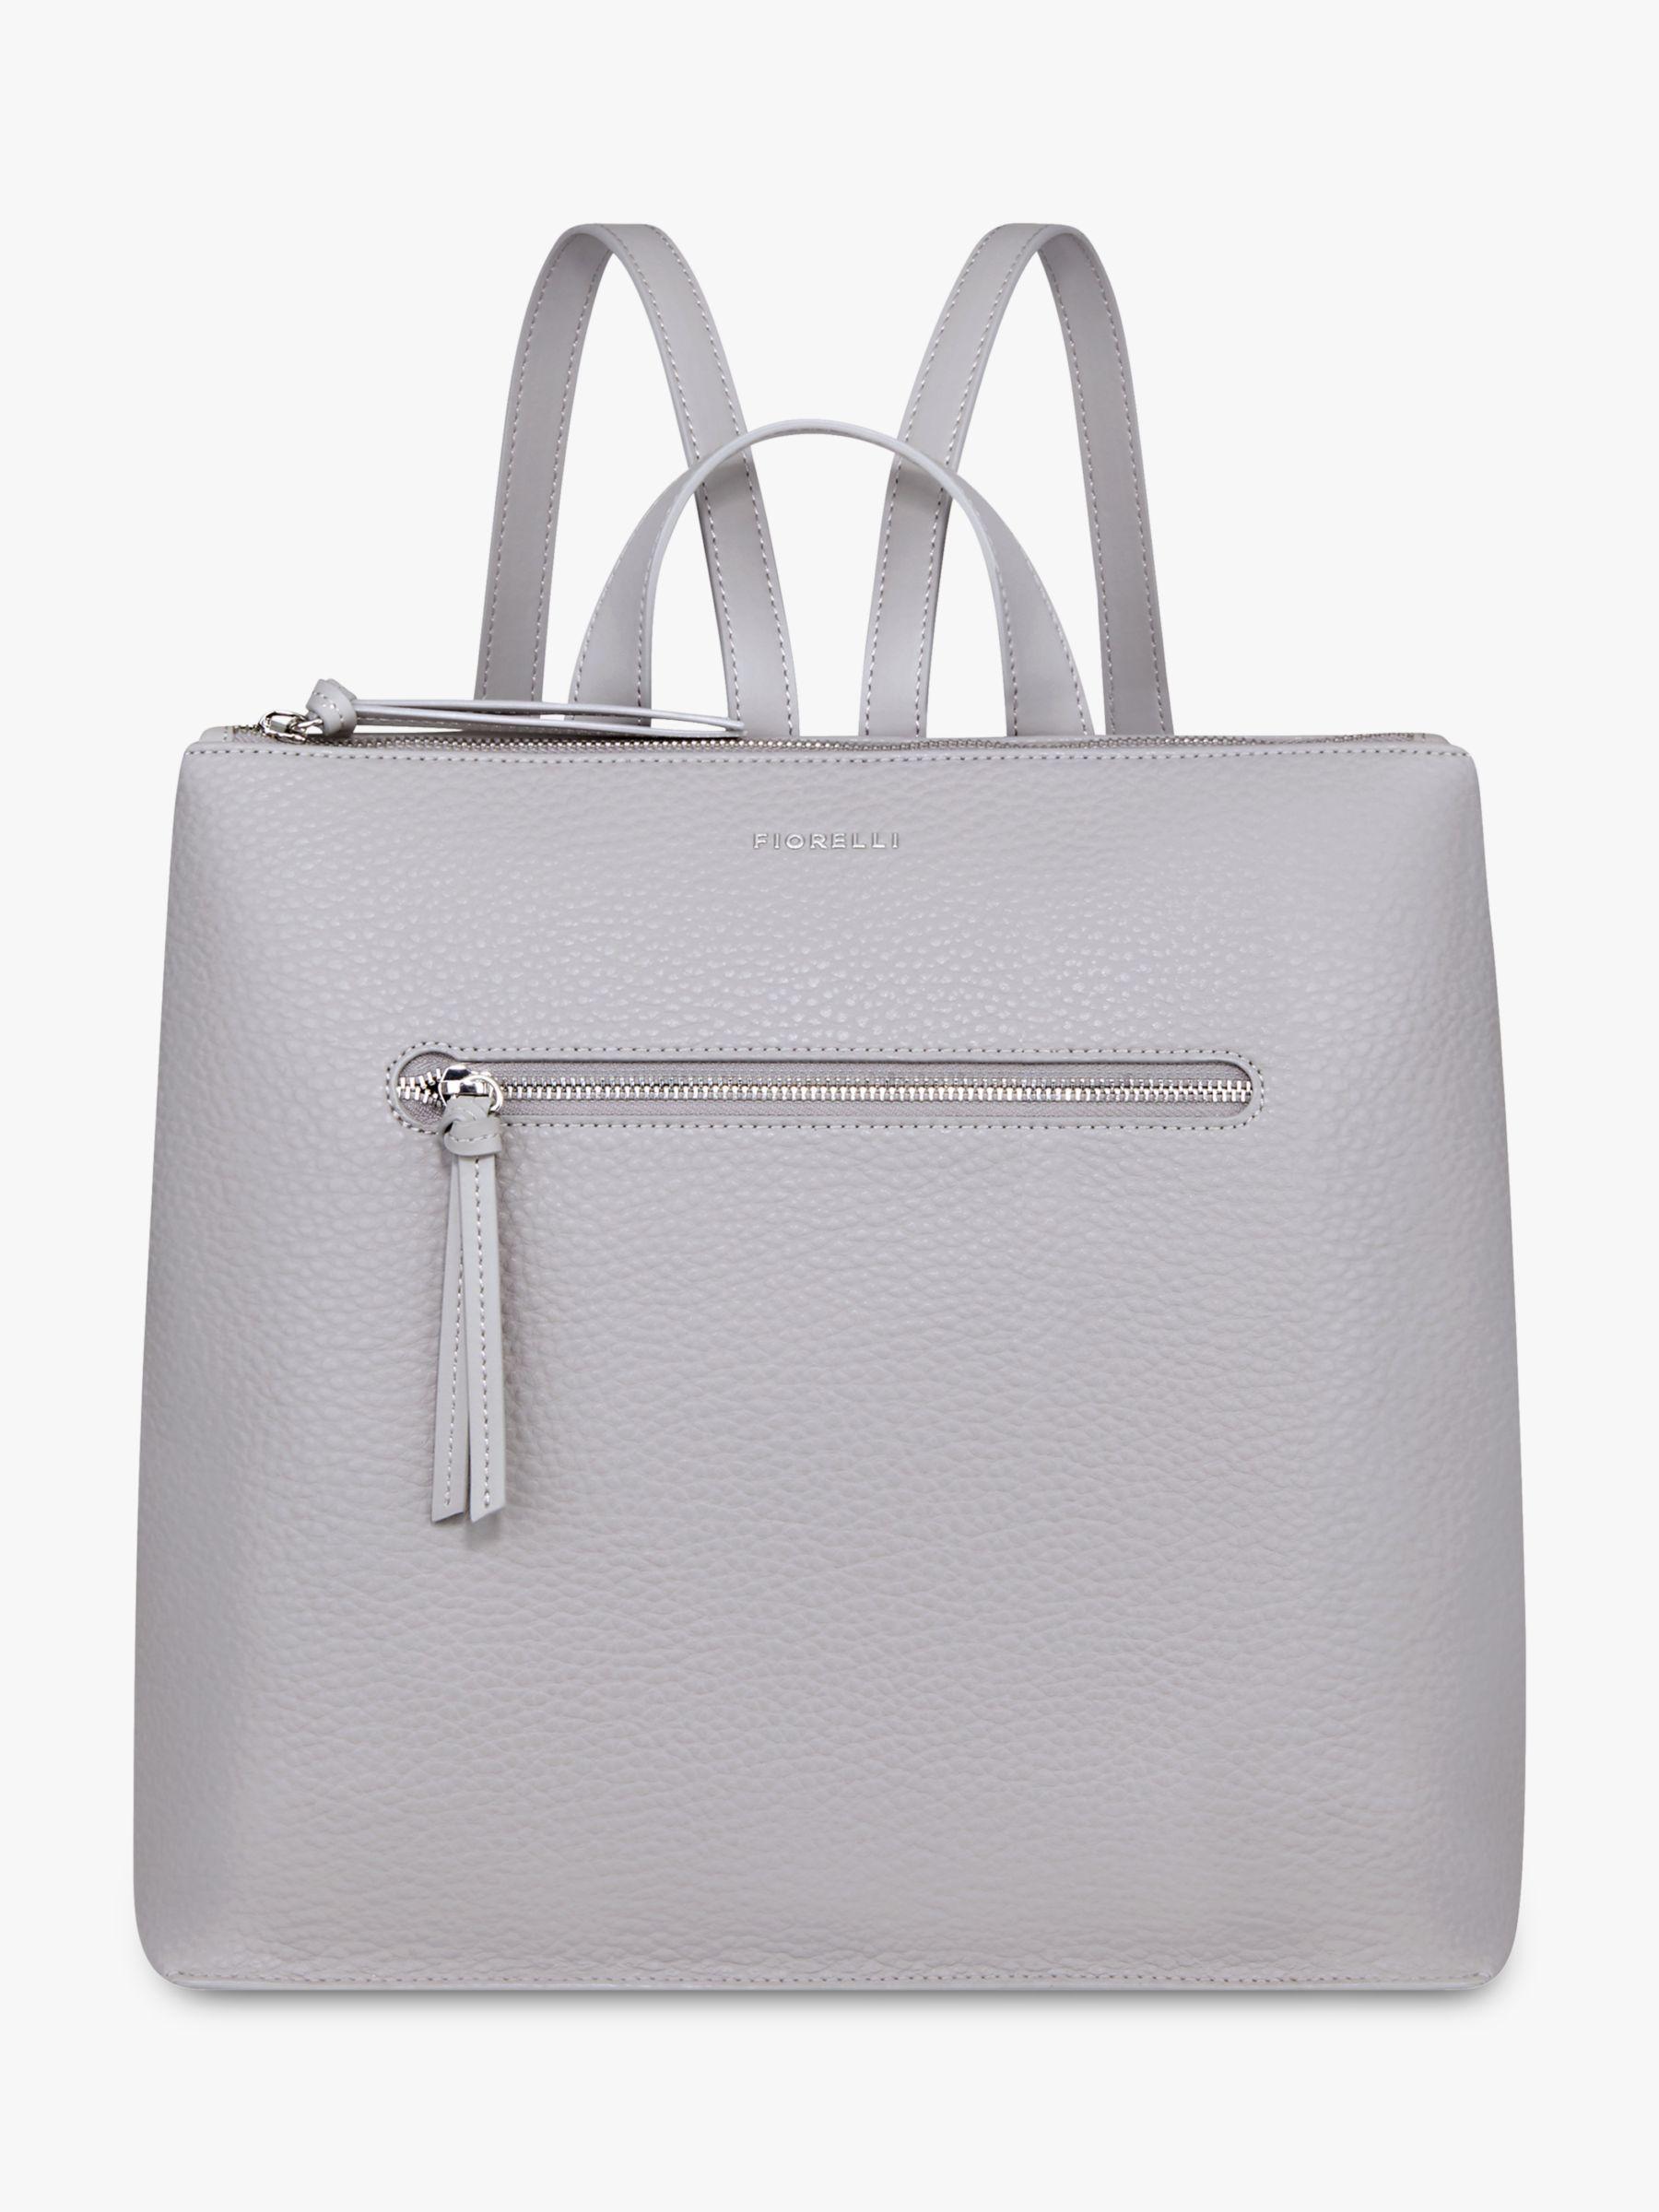 Fiorelli - Gray Finley Large Zip Top Backpack - Lyst. View fullscreen